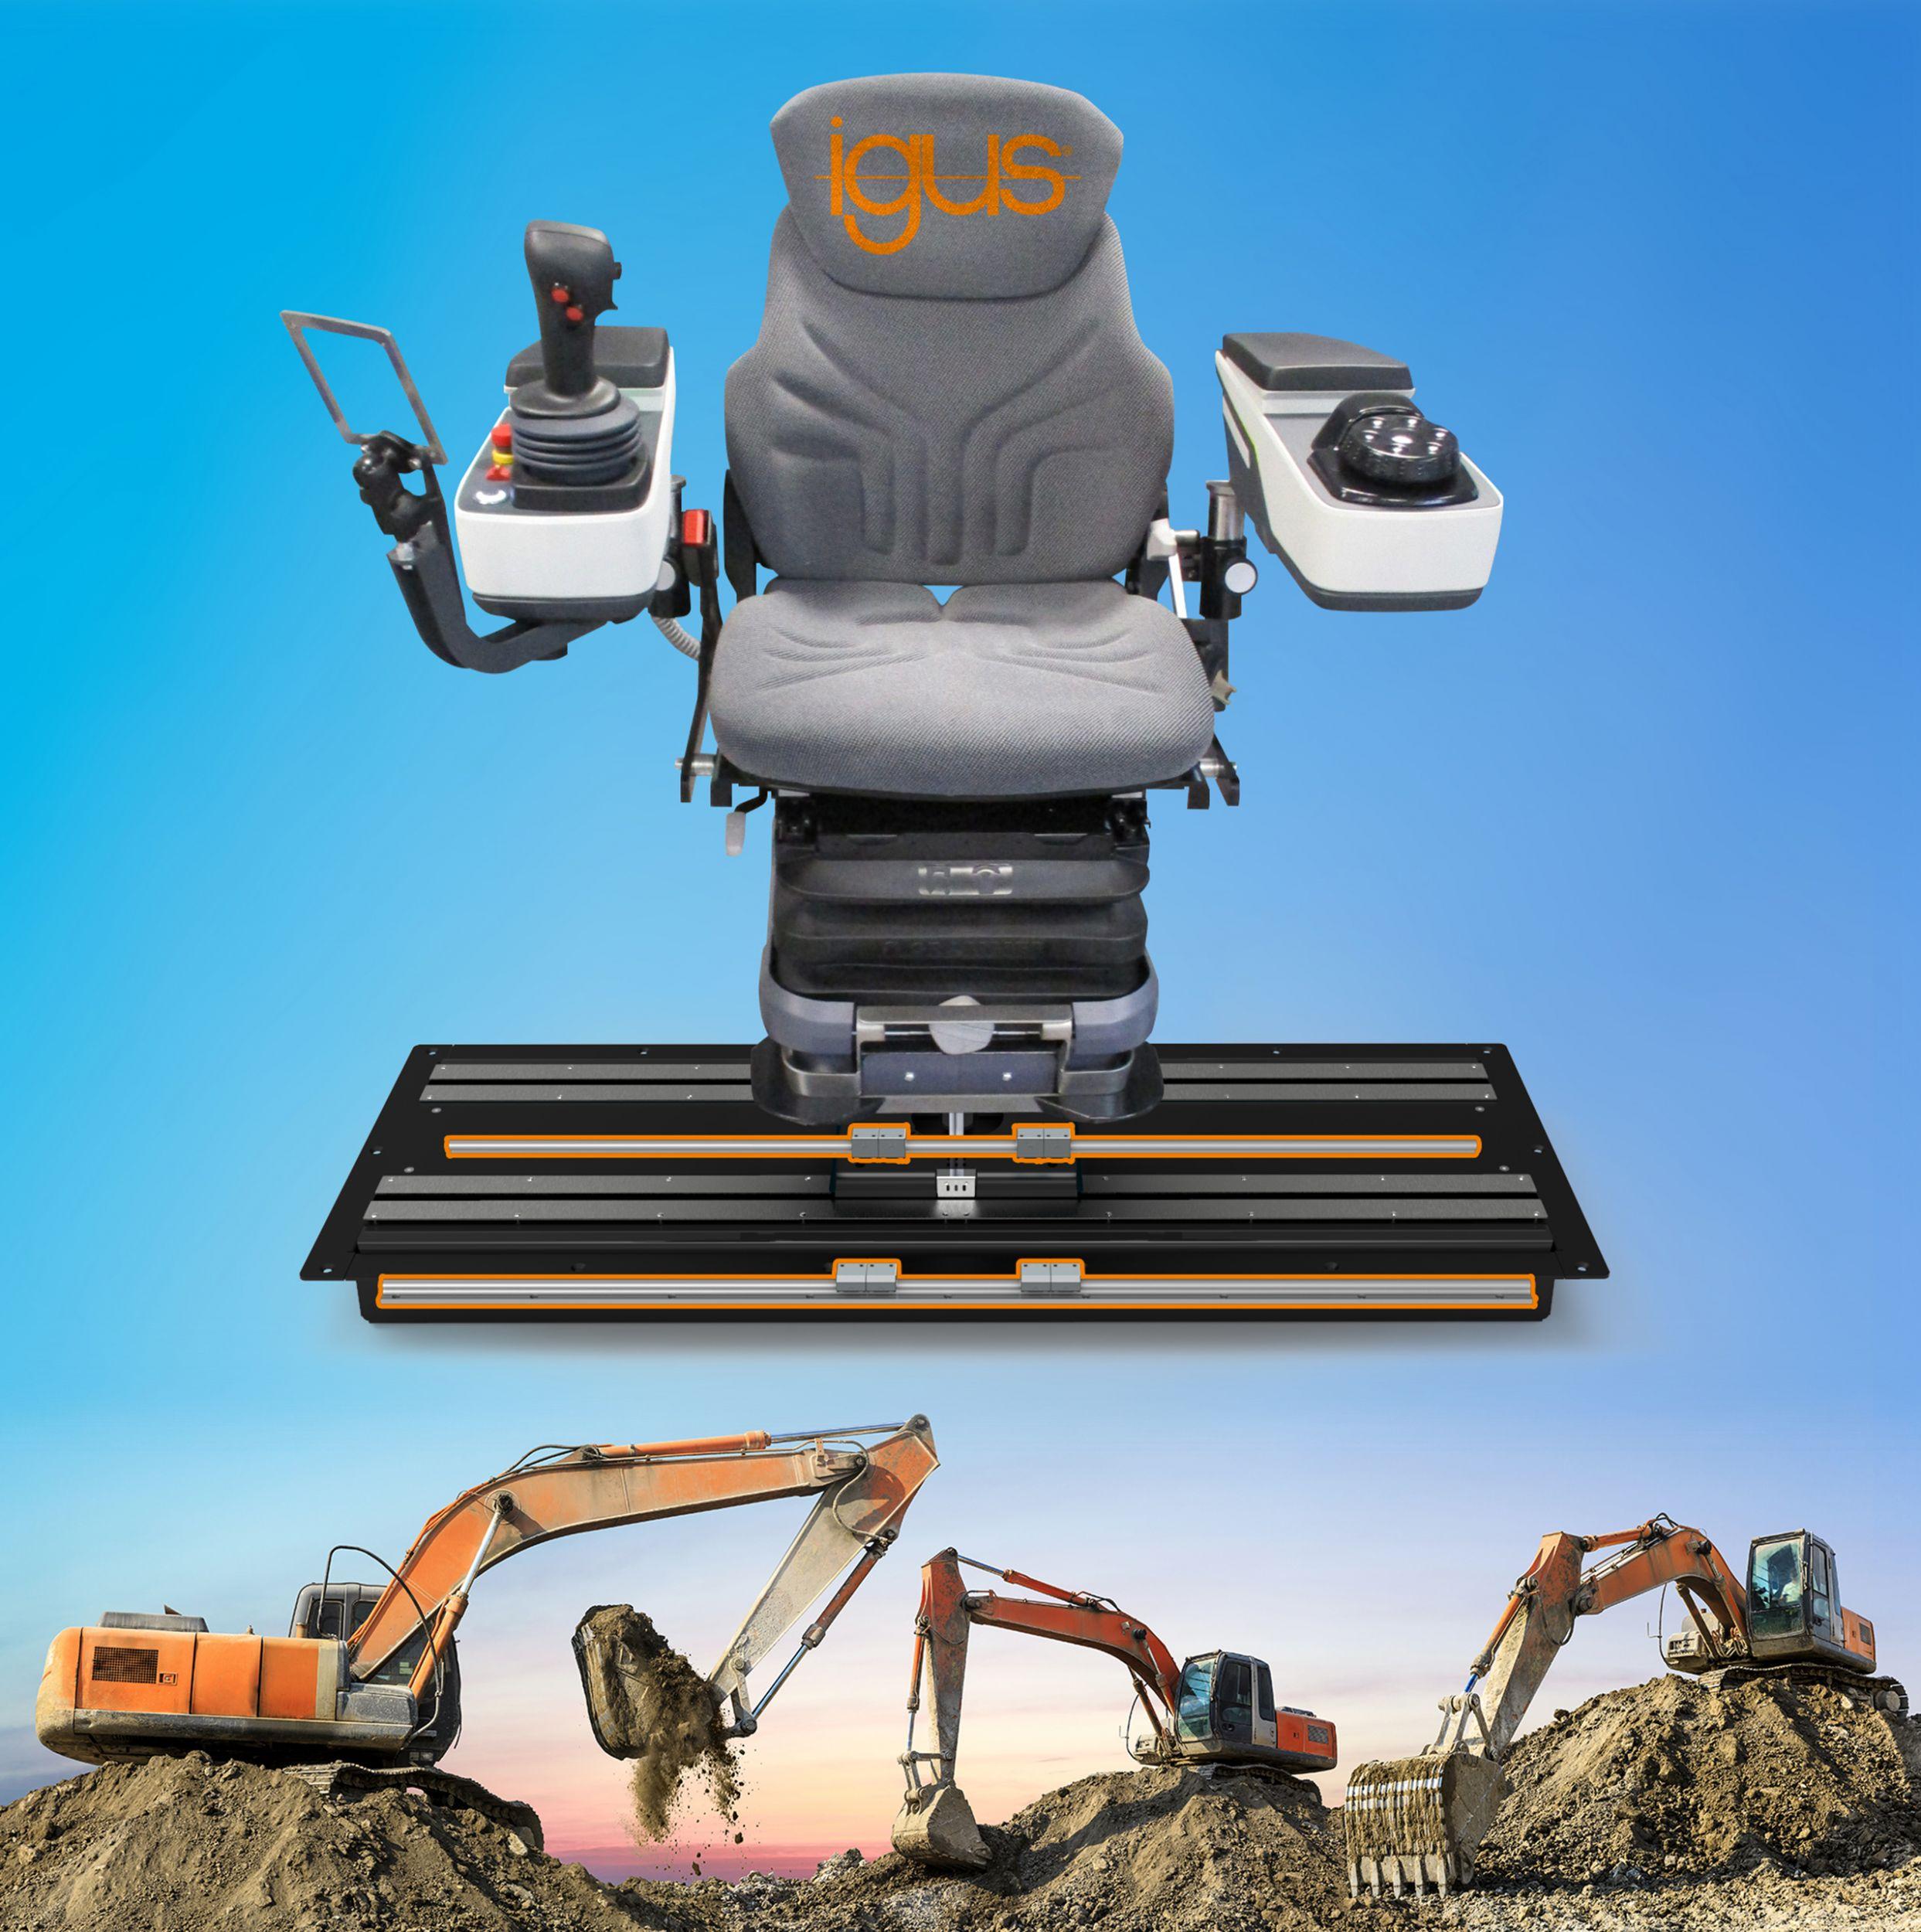 Freie Sicht in Baumaschinen dank Lineartechnik